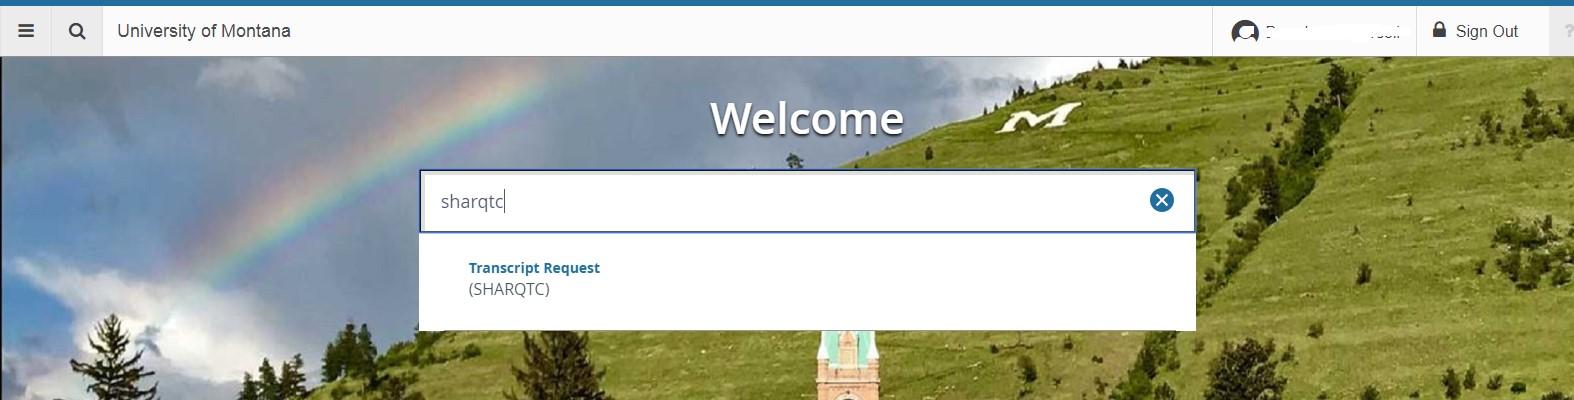 View of SHARQTC search window